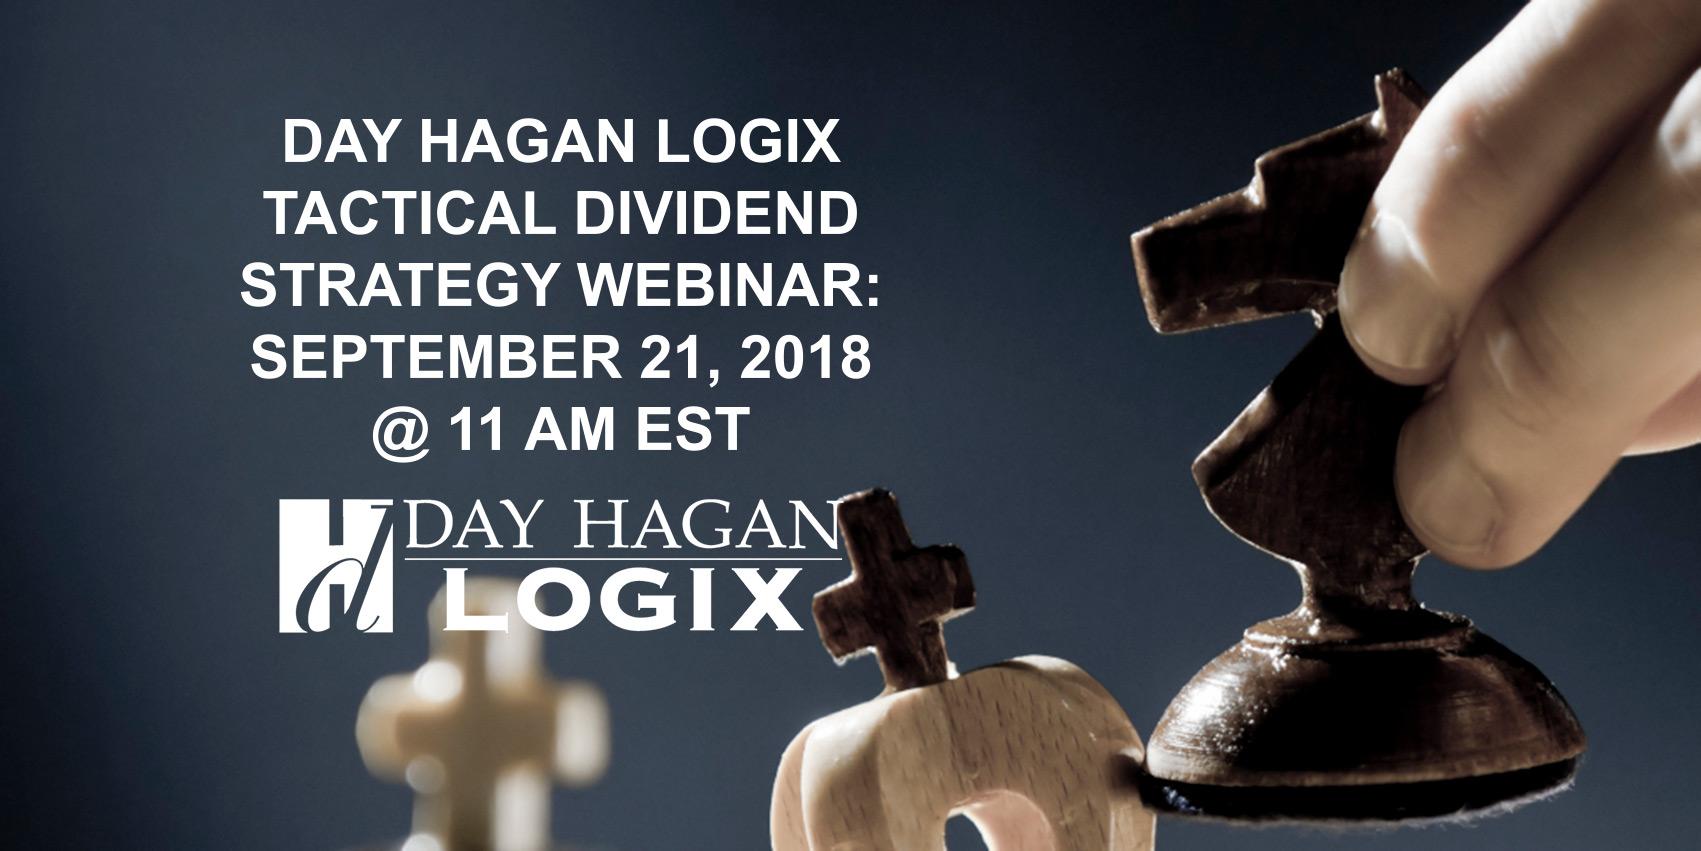 Day Hagan Logix Tactical Dividend Strategy Webinar, September 21, 2018 at 11 AM EST.